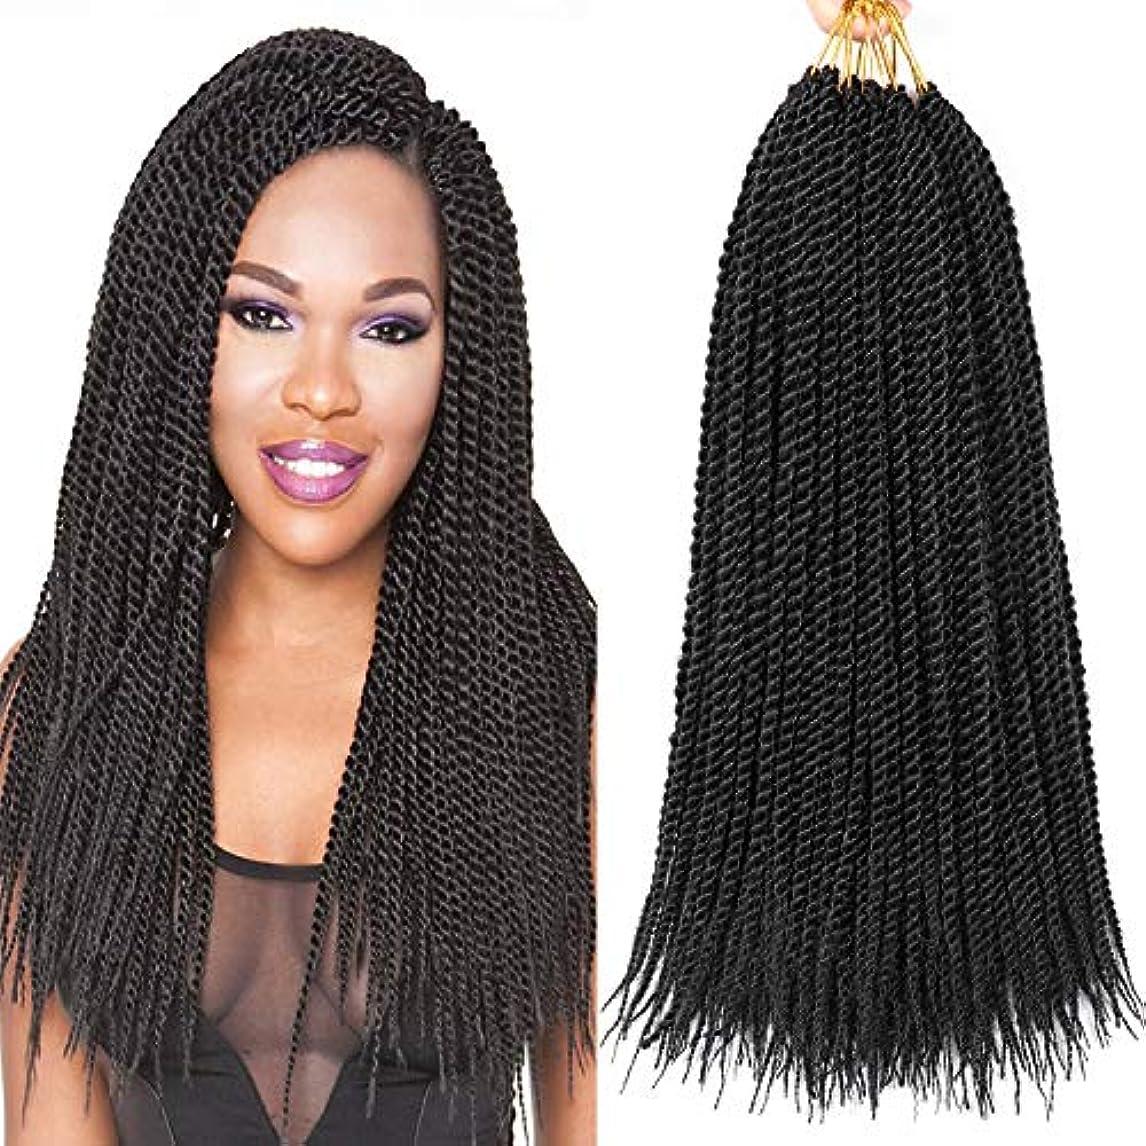 8 Packs 18 Inch Senegalese Twist Crochet Hair Synthetic Braiding Hair Extension Short Small Havana Mambo Twist Crochet Braids 20strands/pack (18 Inch, 1B) naymc87539197411